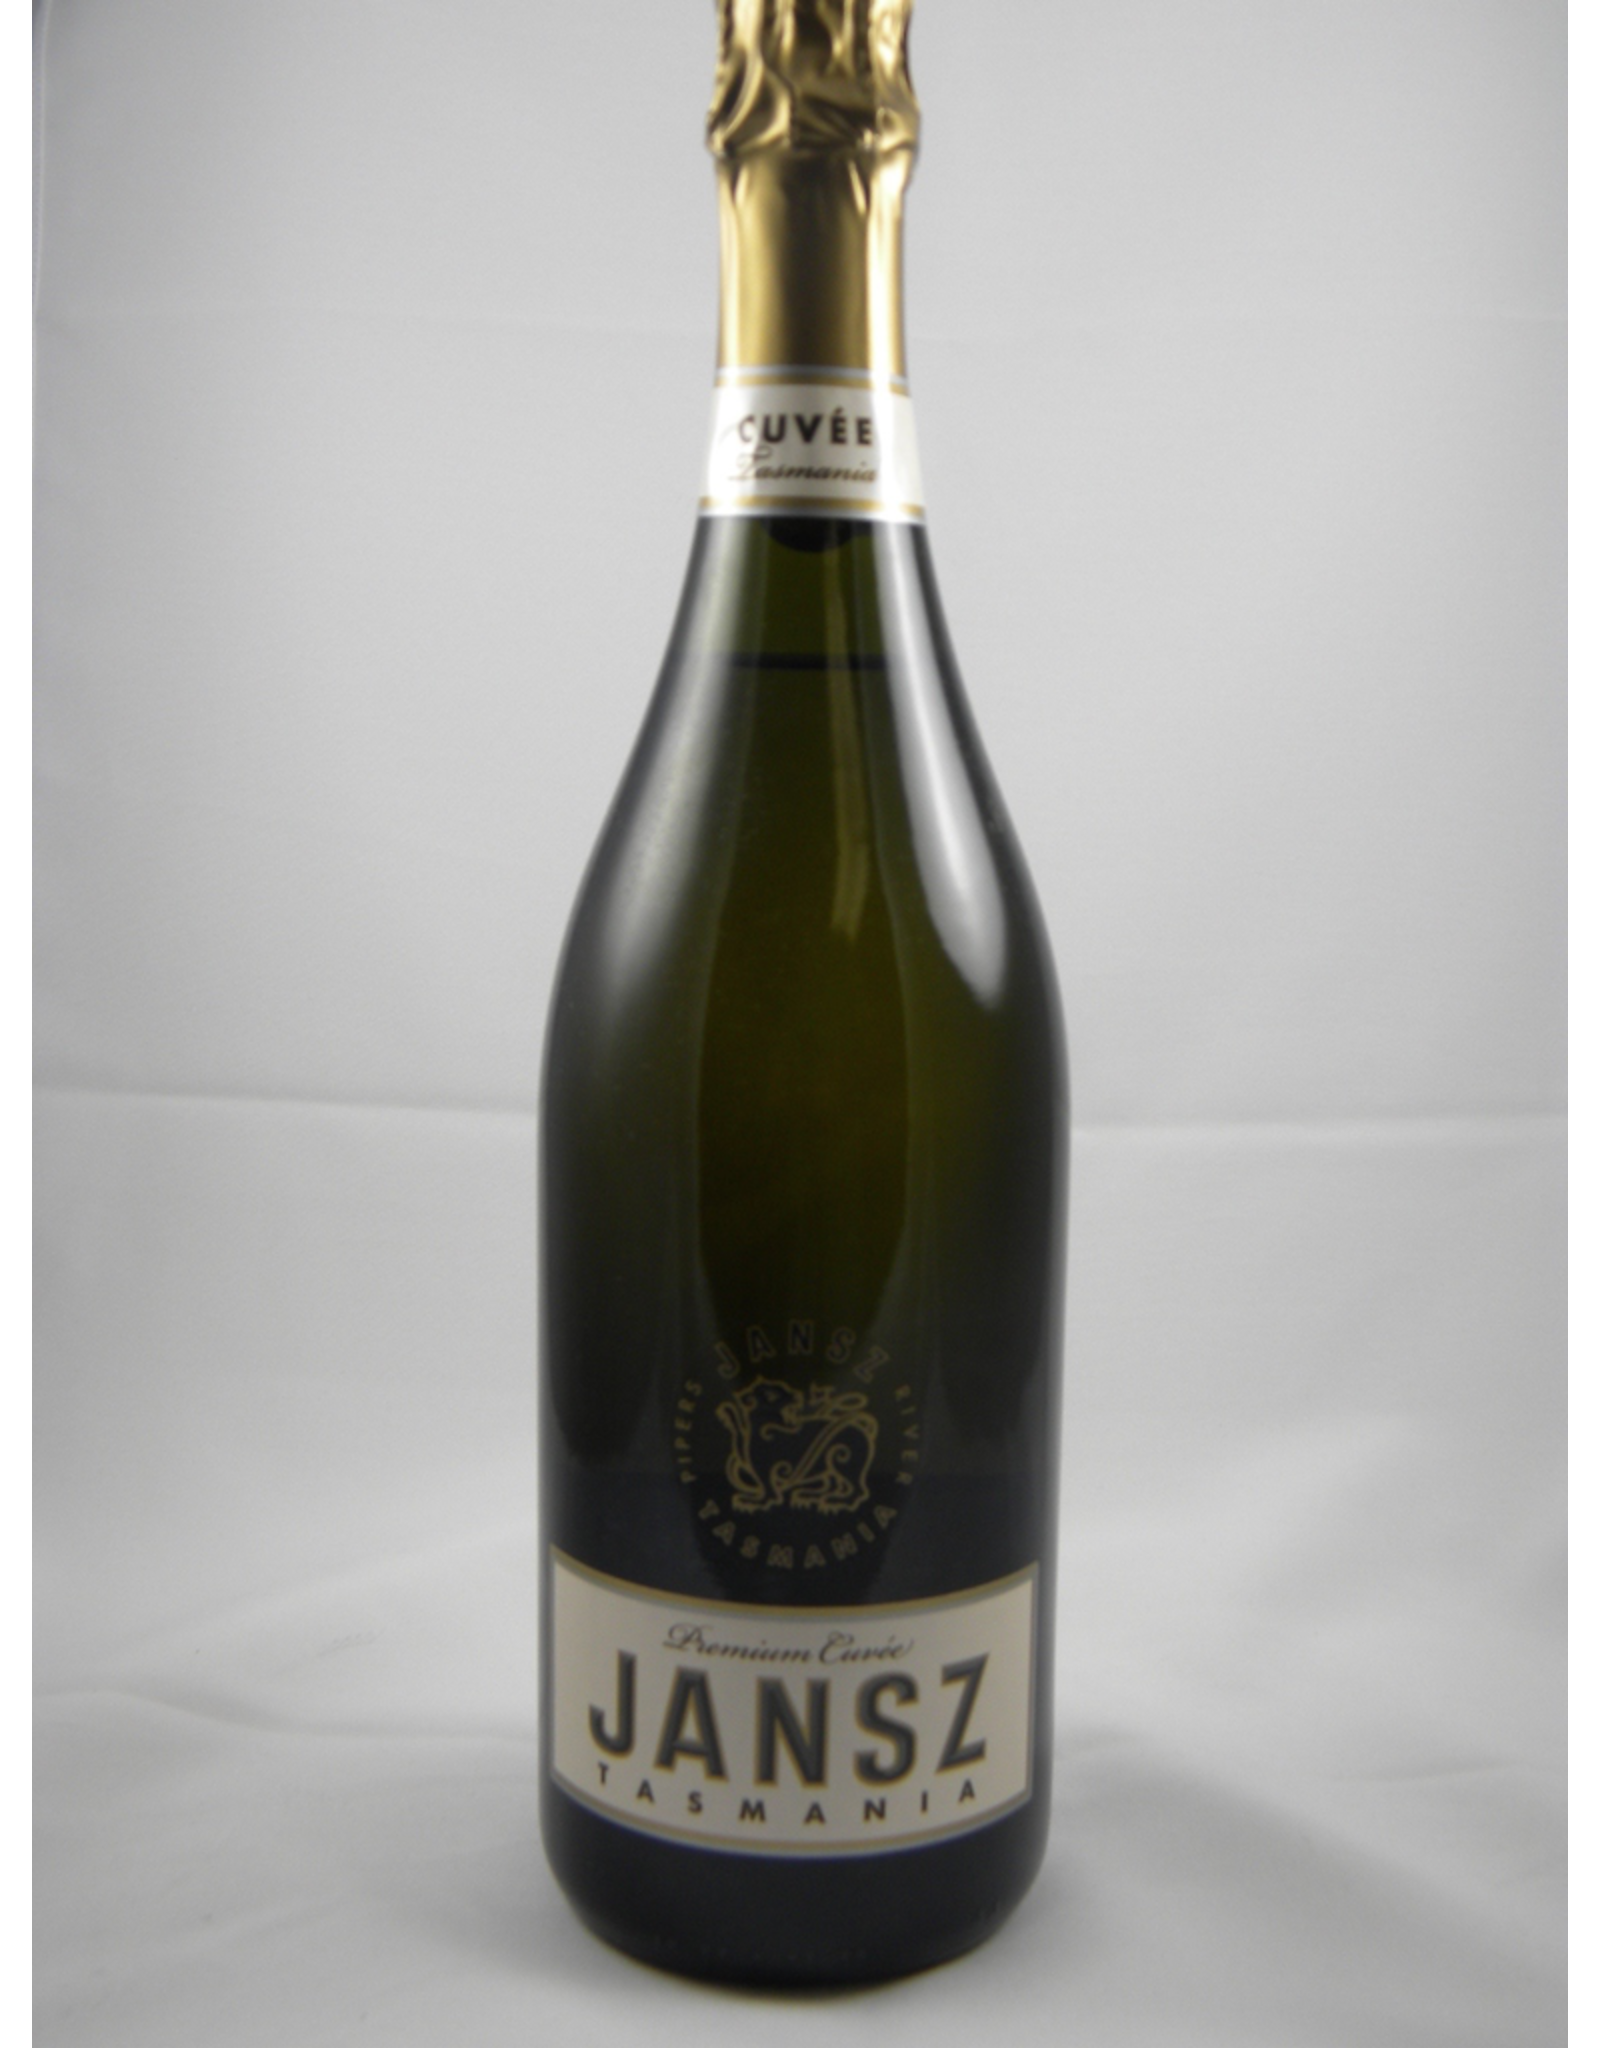 Jansz Jansz Premium Cuvée Sparkling Tasmania NV